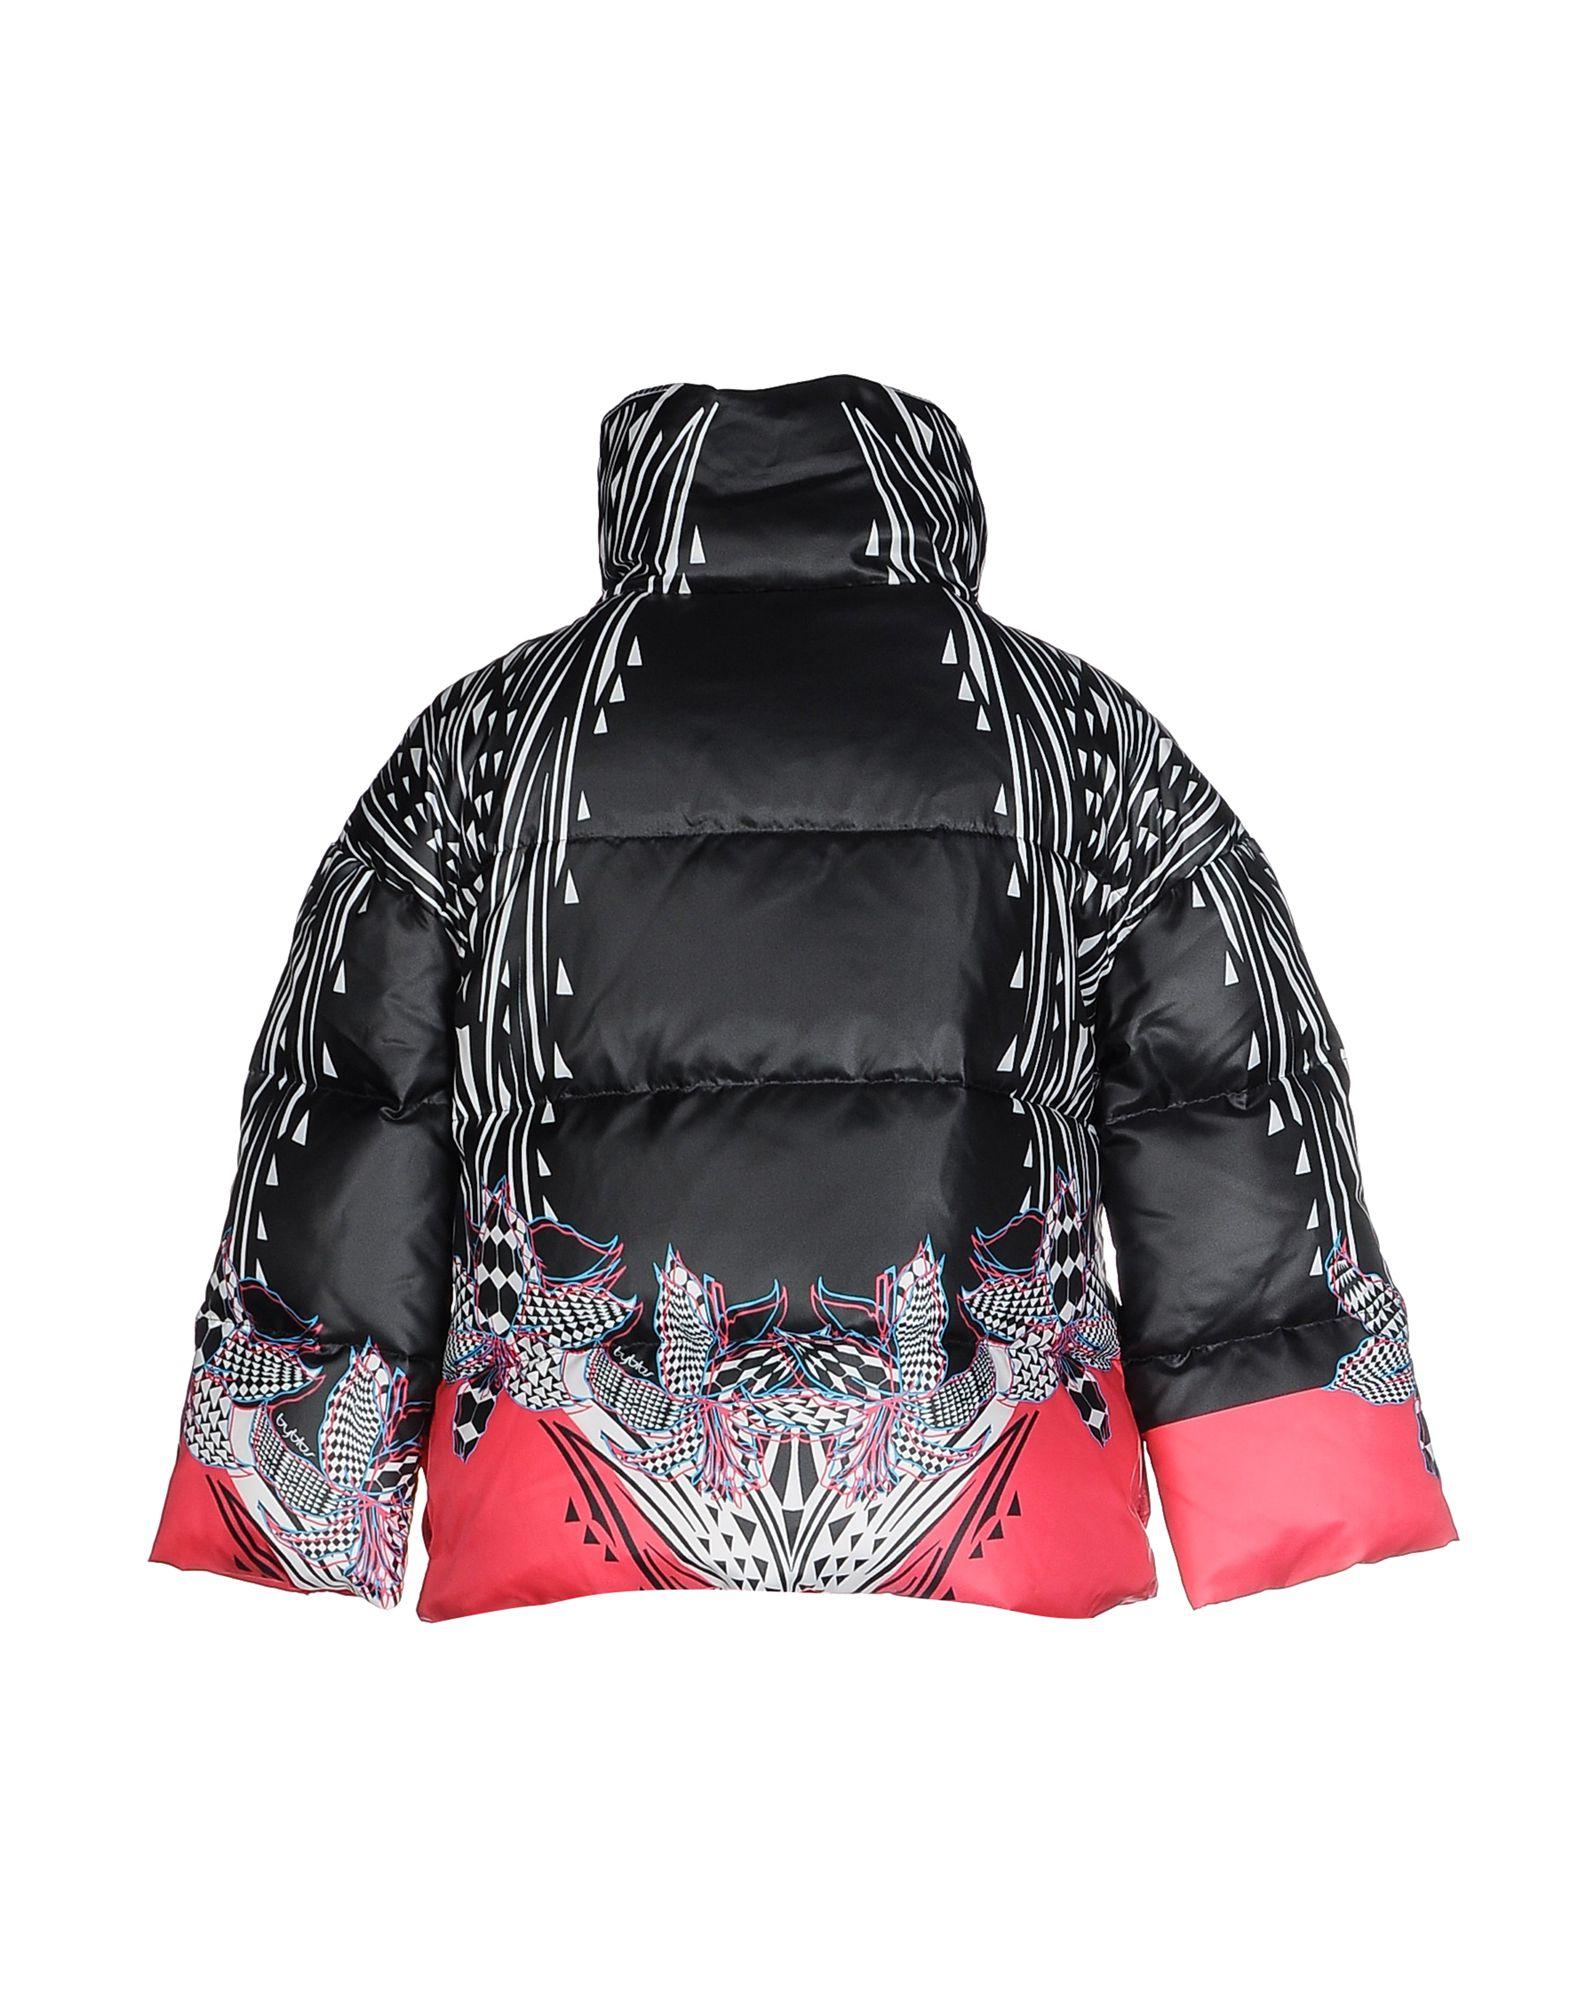 Byblos coat 2